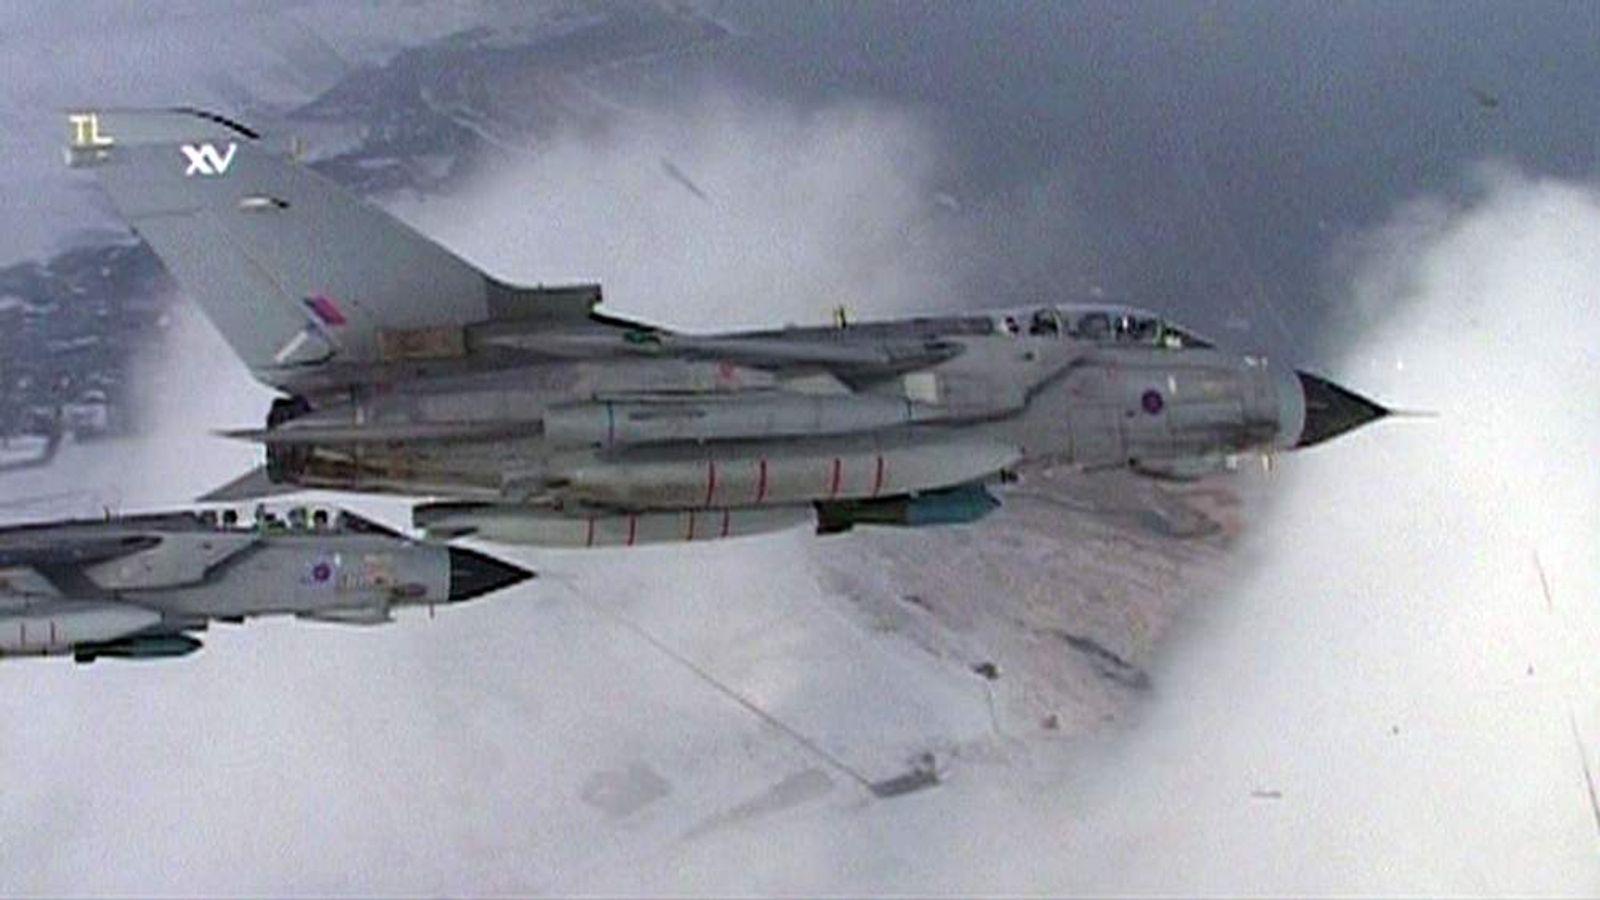 Tornado GR4 jets